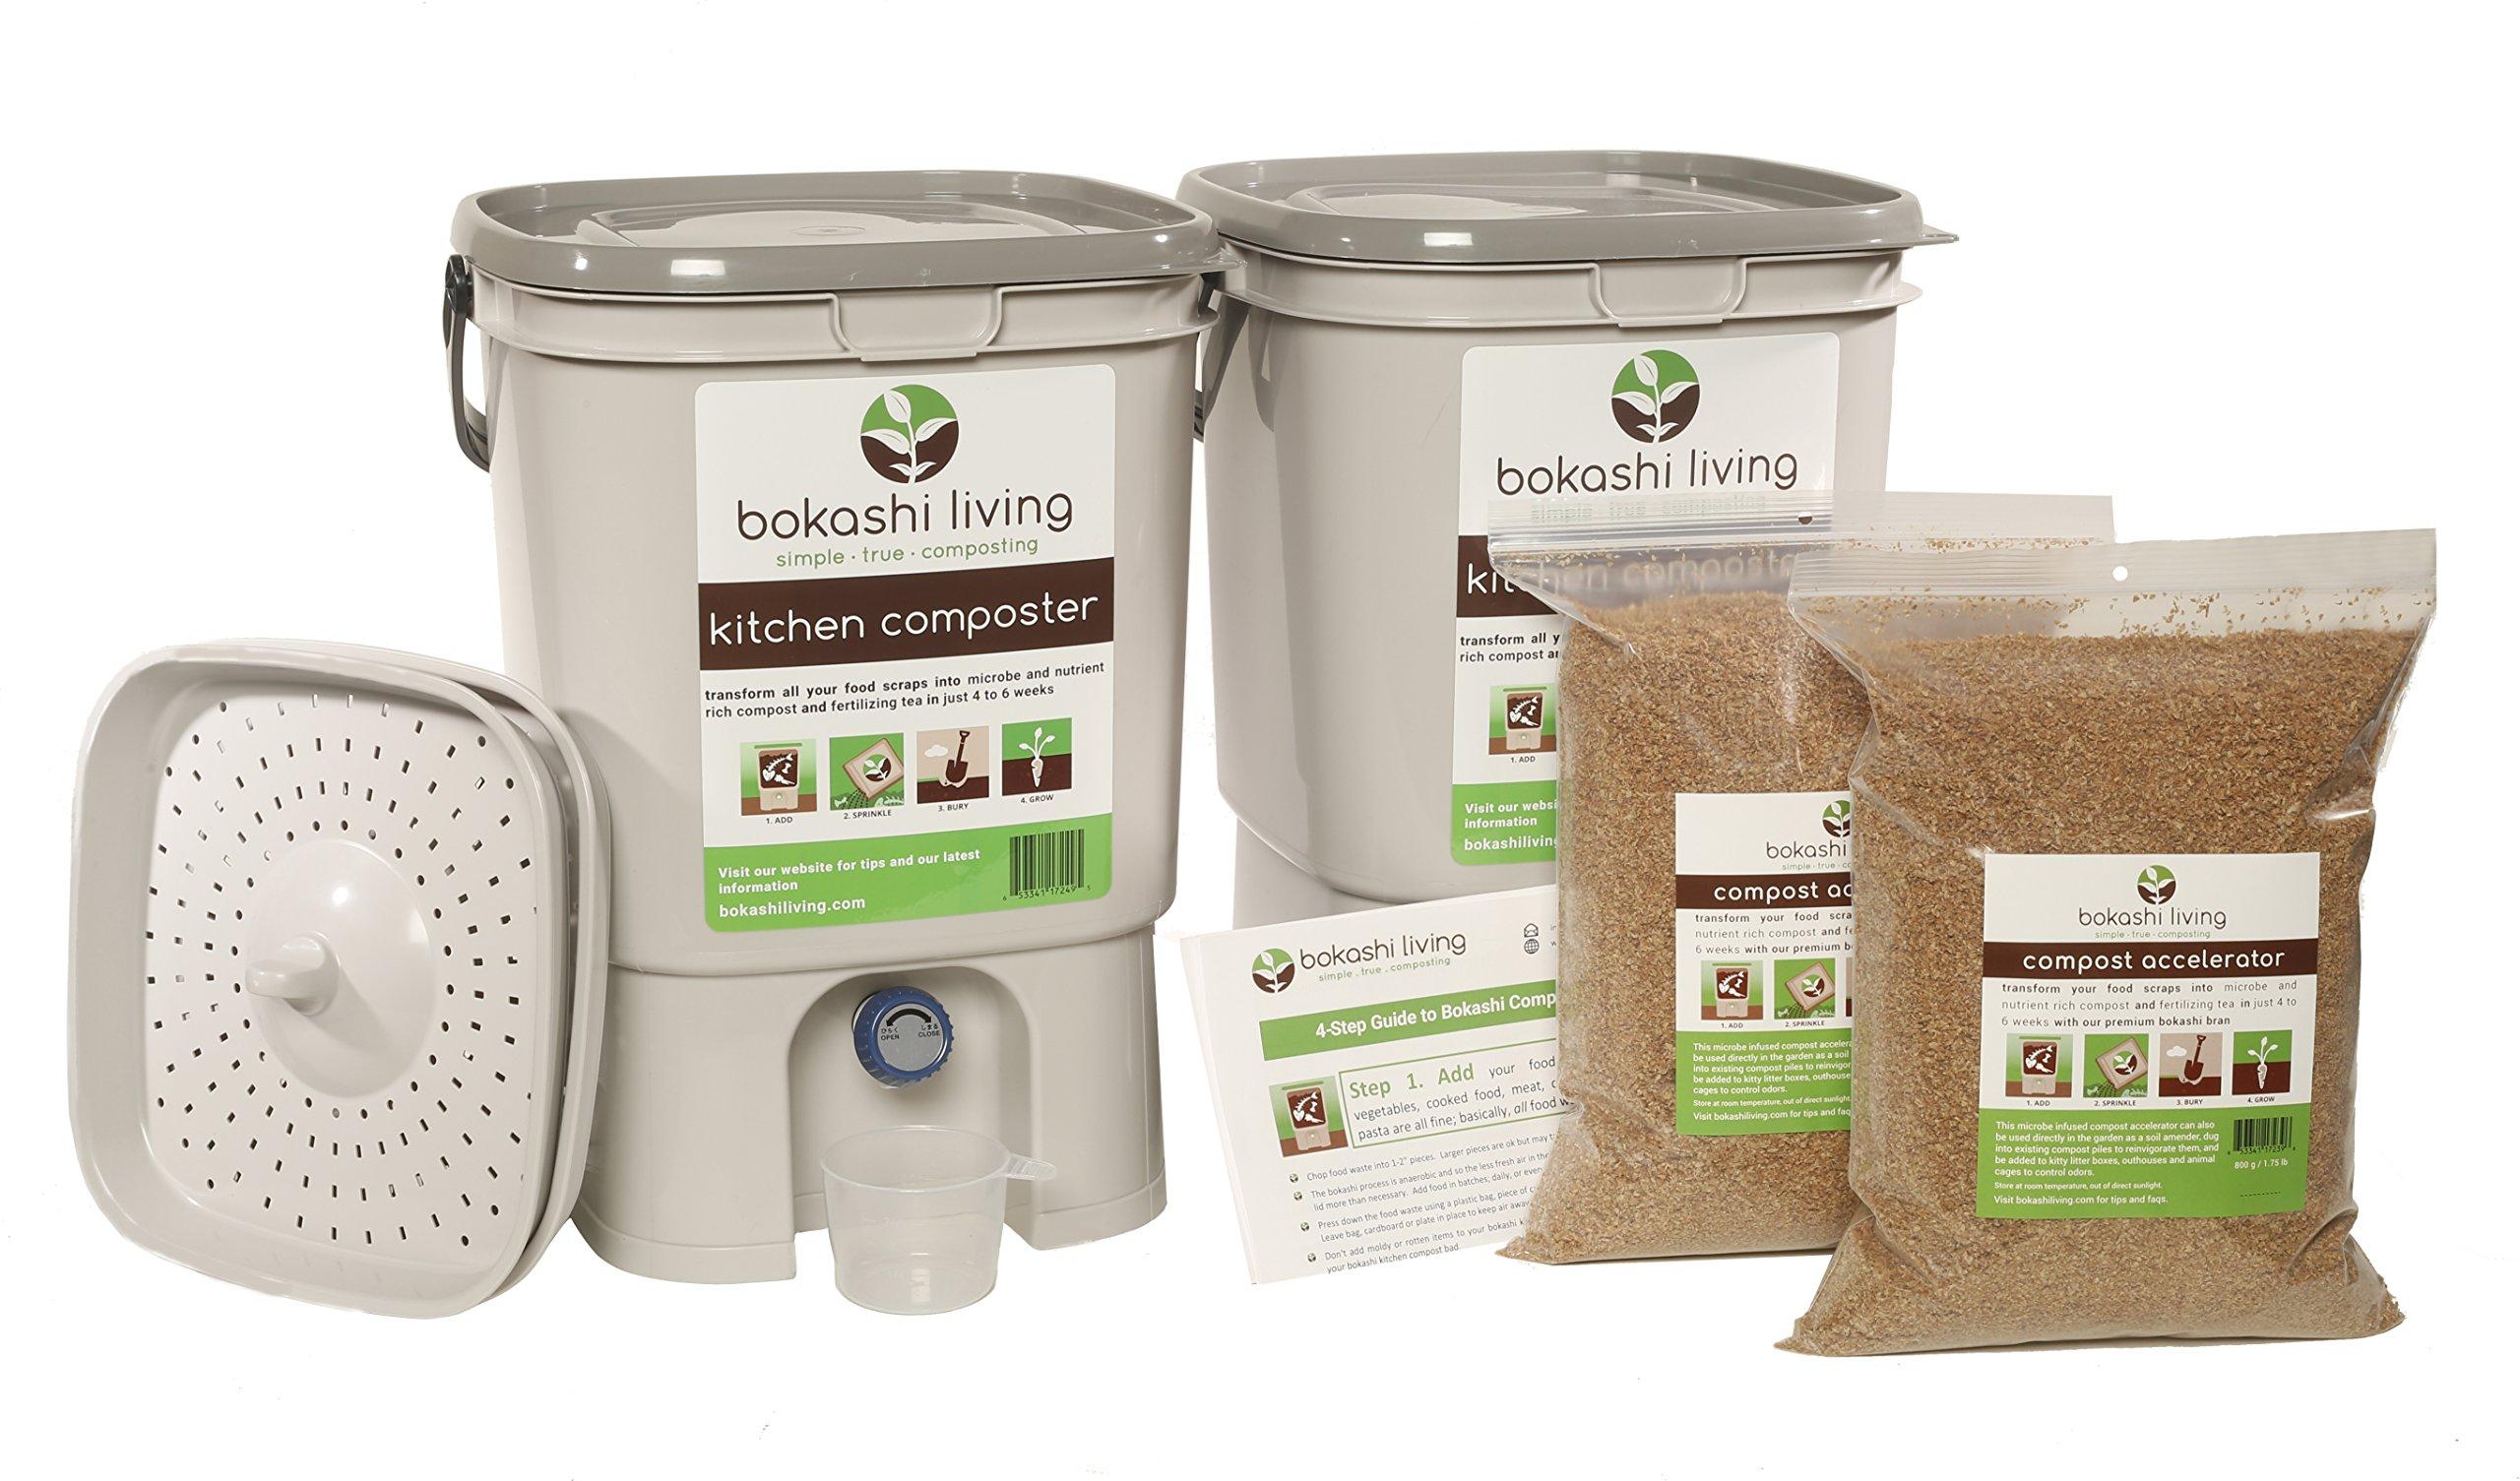 2 bin Bokashi Composting Starter Kit (includes 2 bokashi bins, 3.5lbs of bokashi